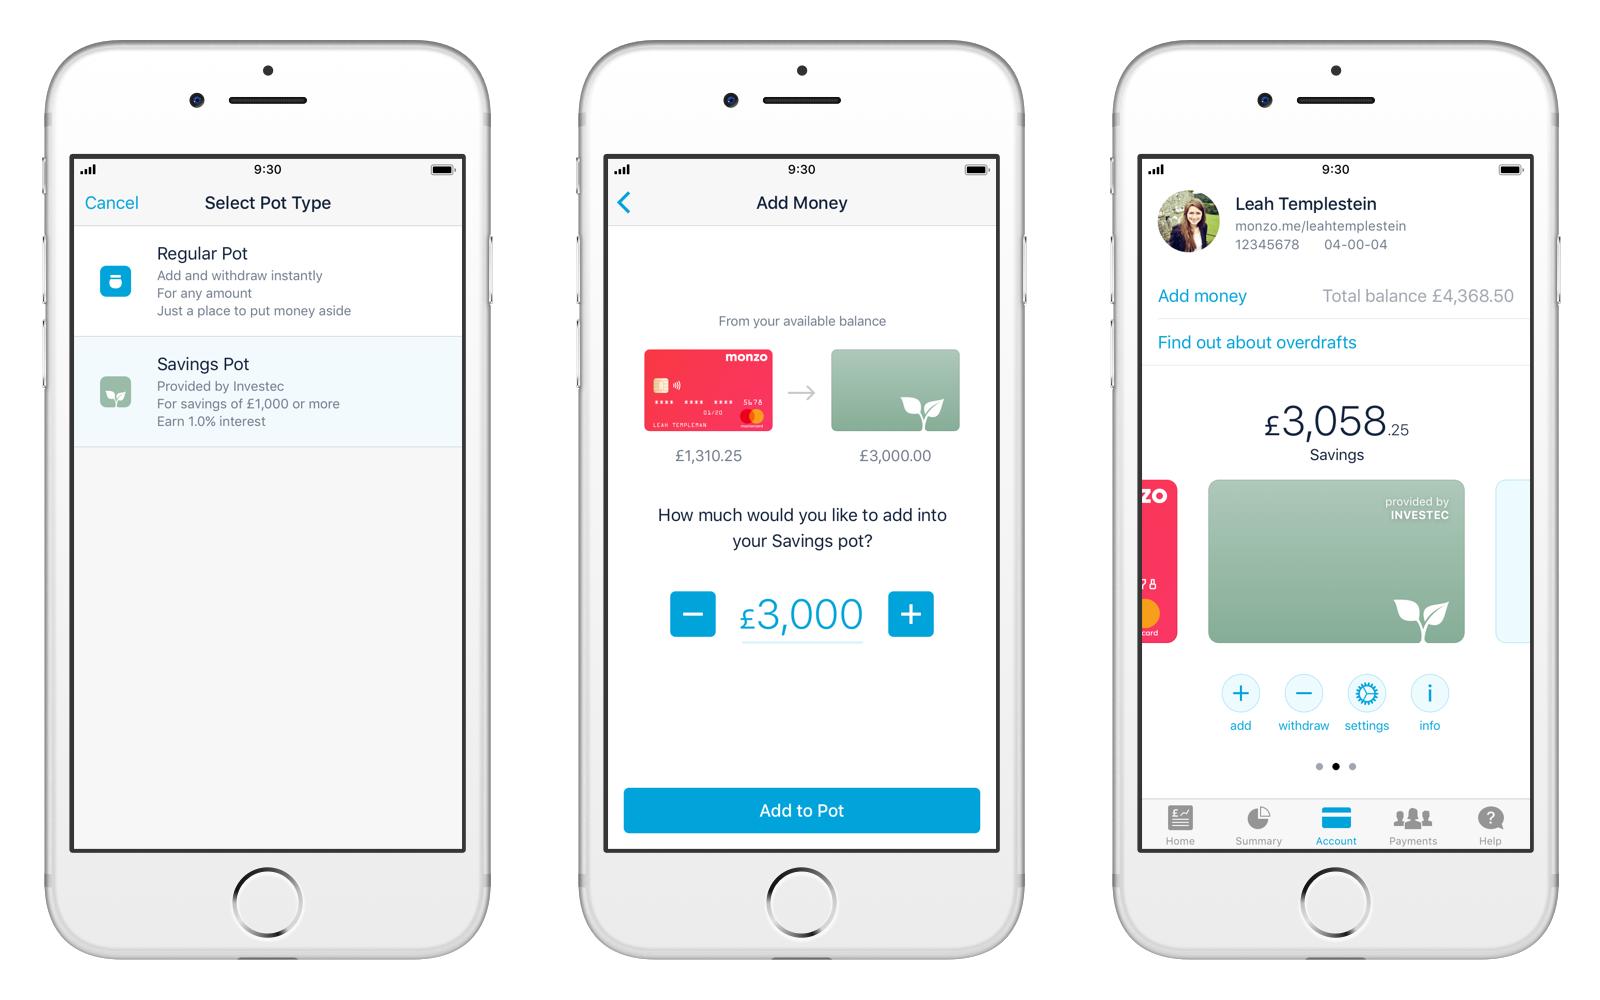 Screens showing Savings Pots in-app